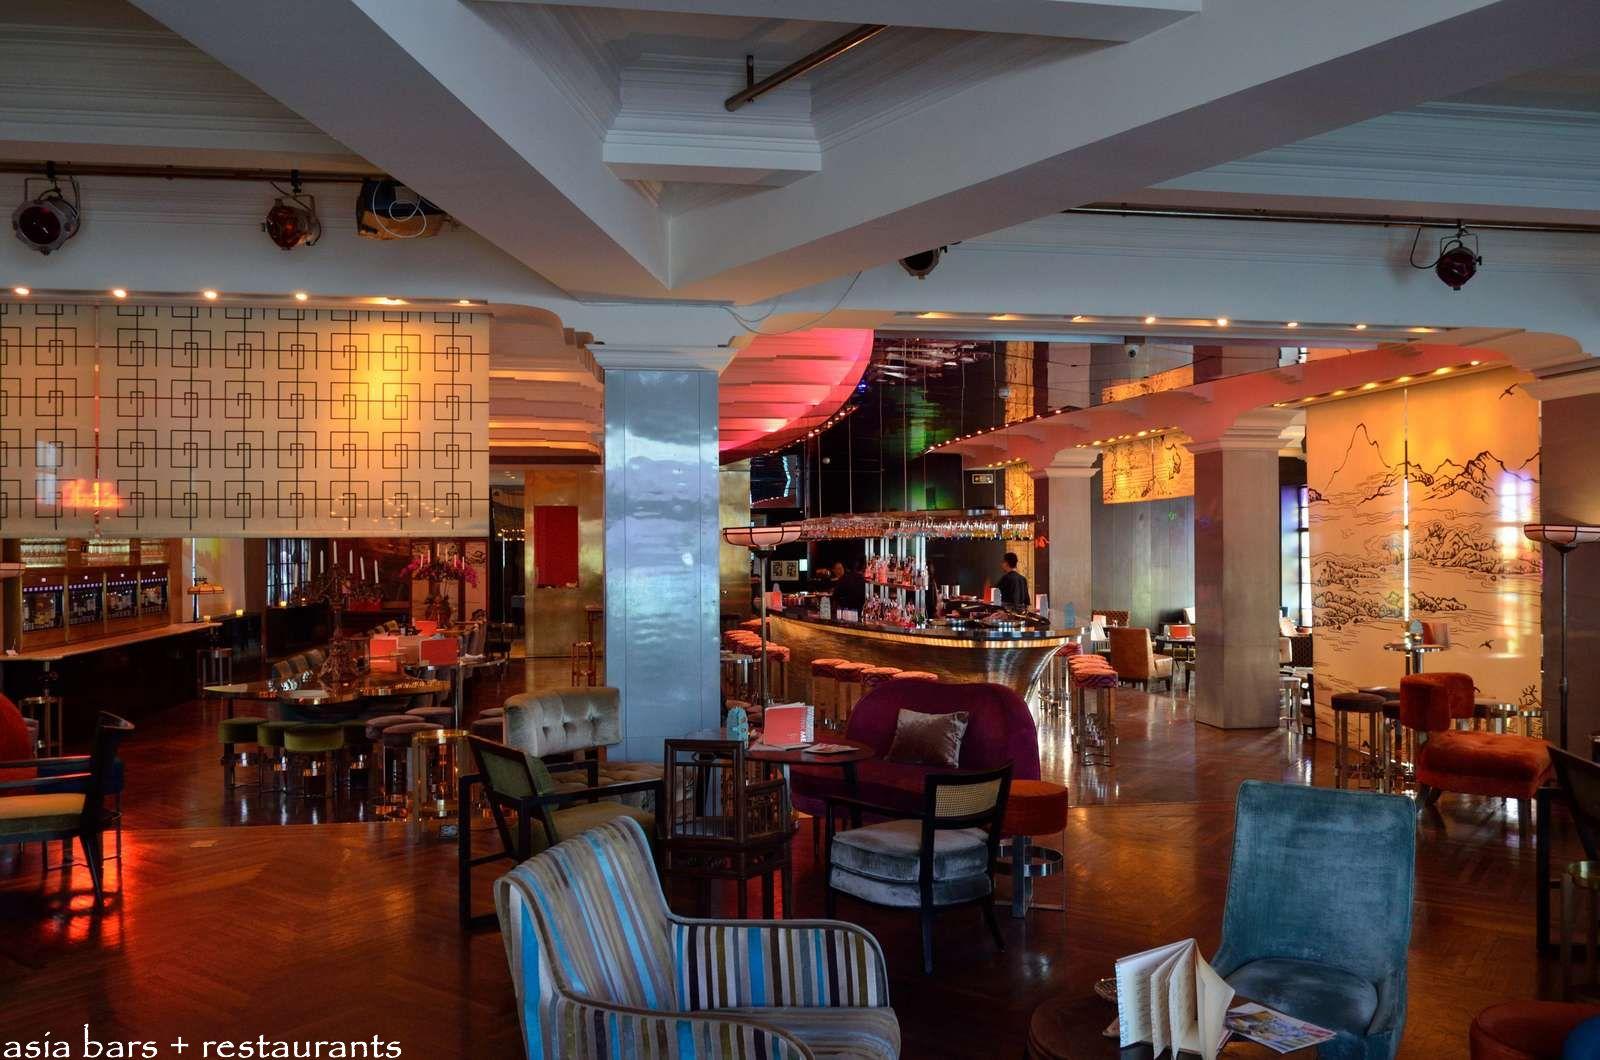 Deco Lounge Bar Restaurant : M glamour bar cocktail lounge the bund shanghai